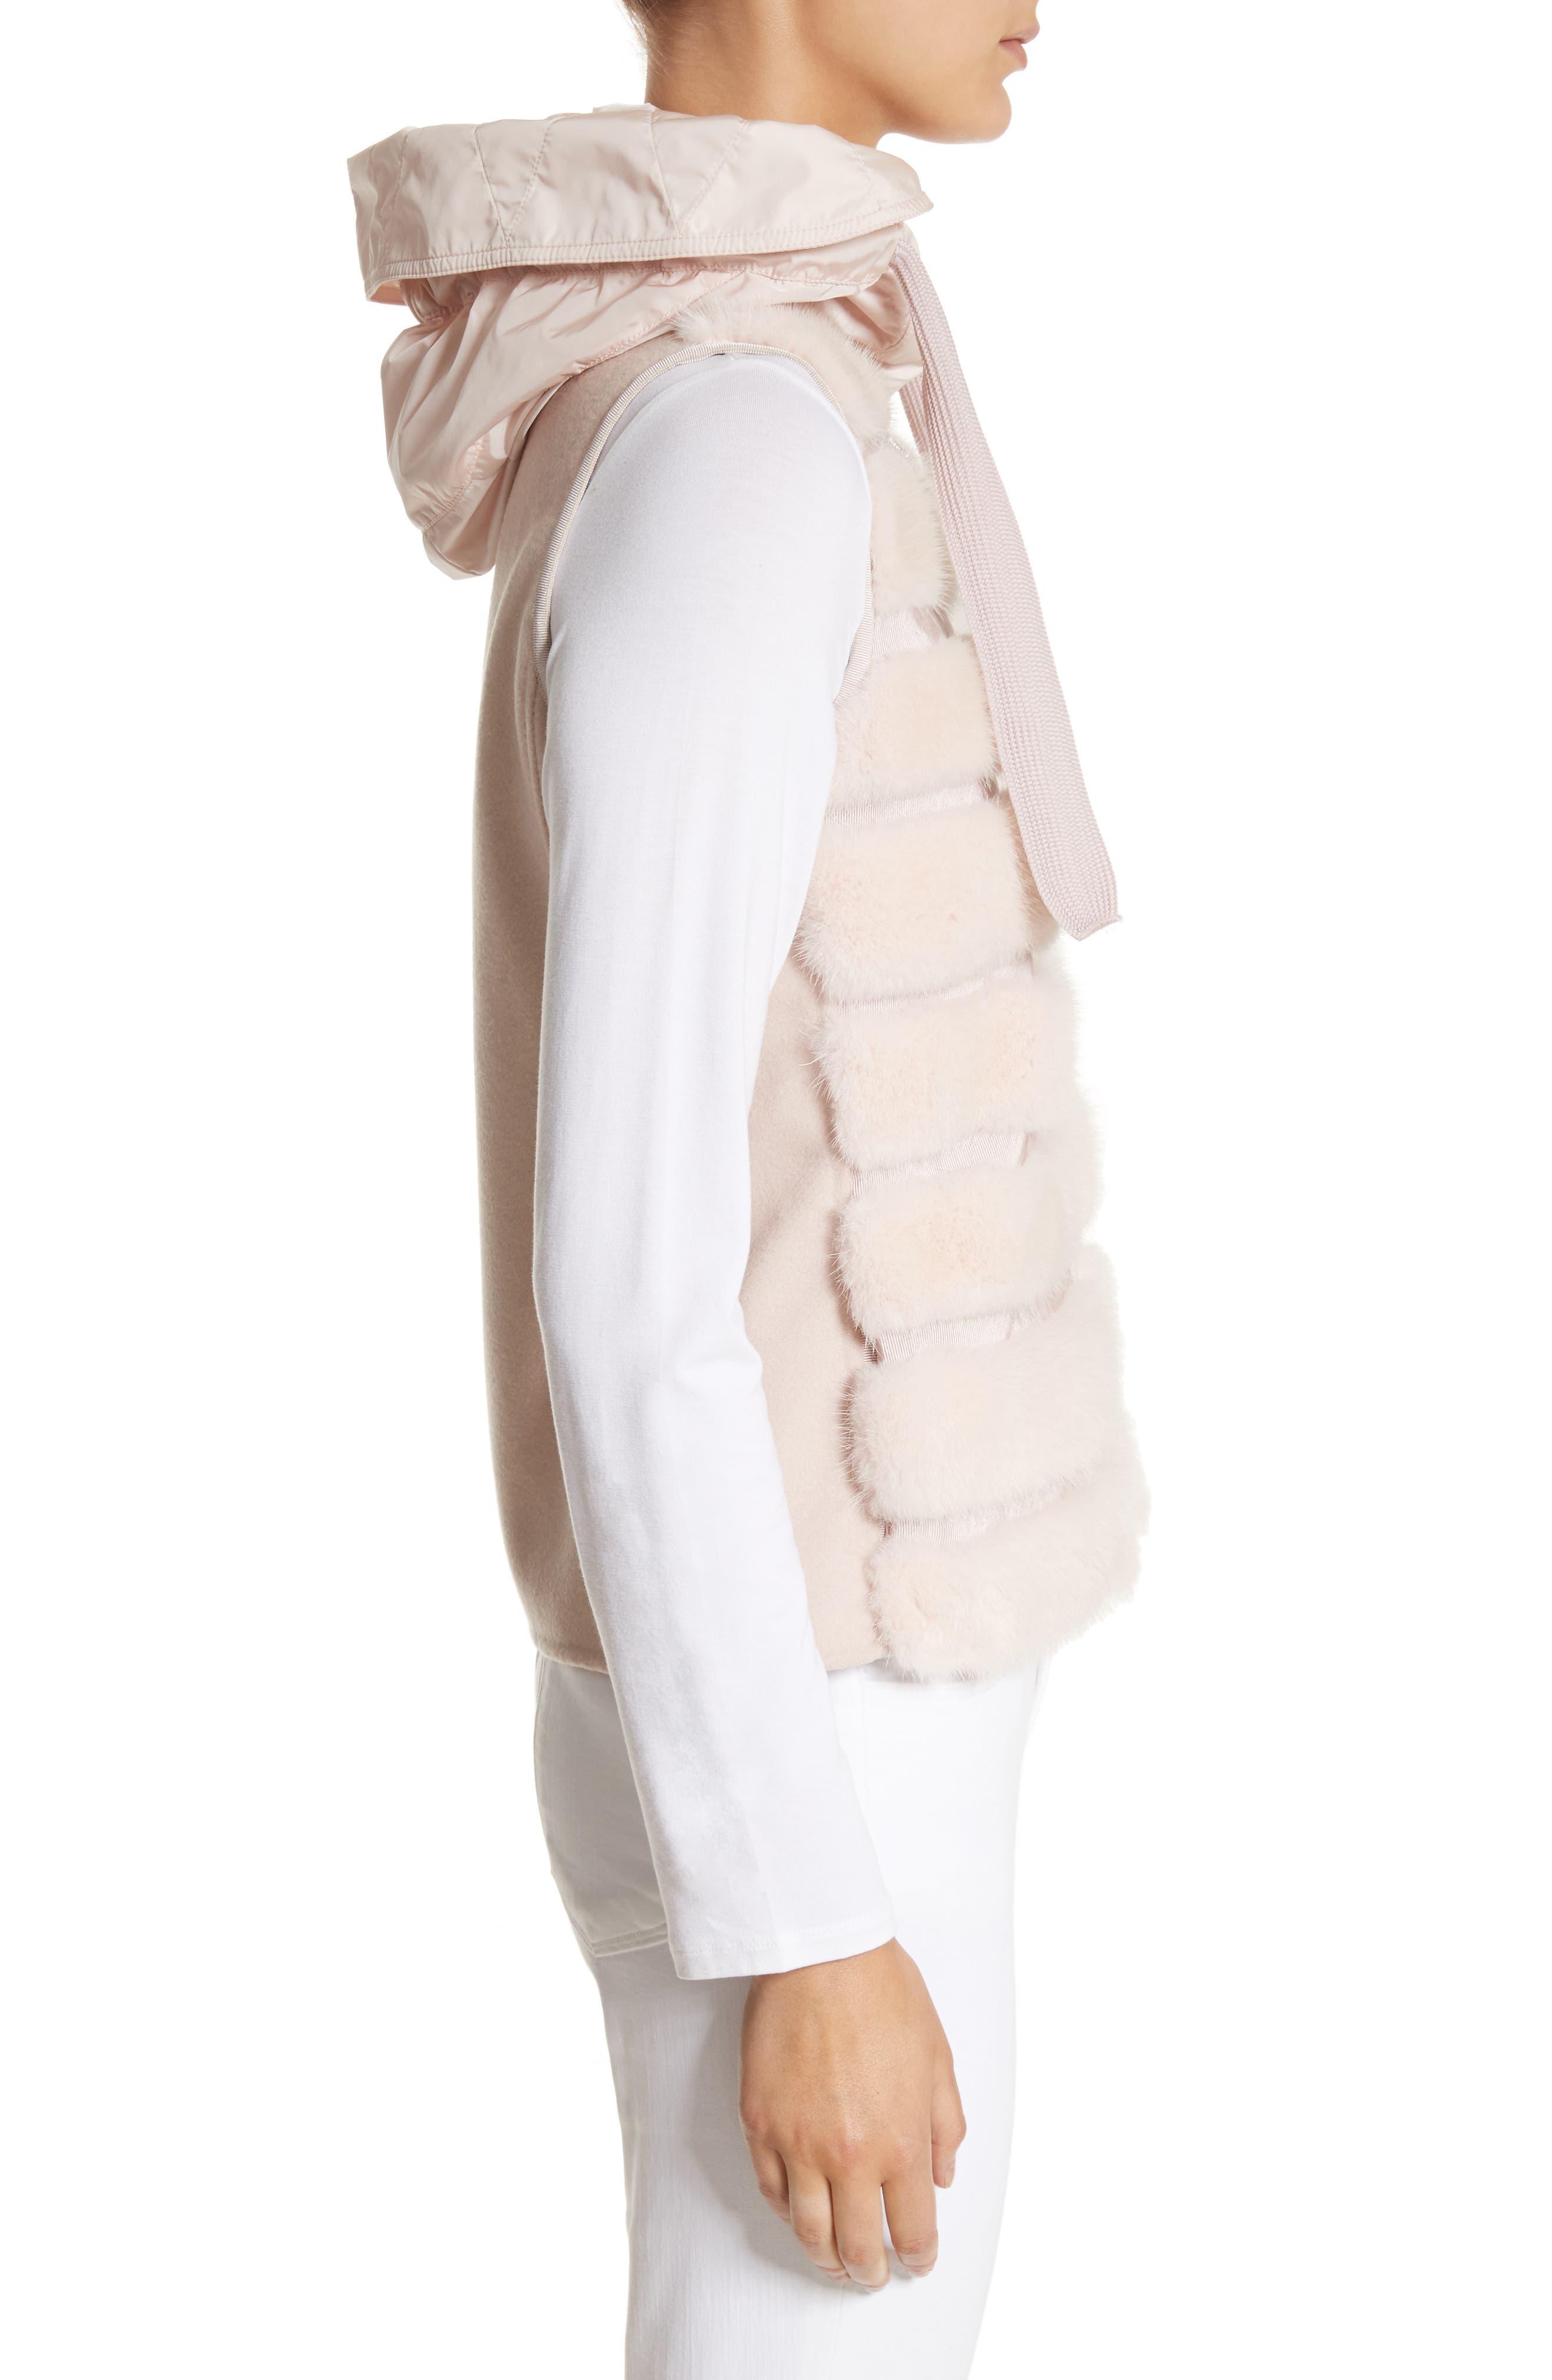 Ametrine Wool & Cashmere Vest with Genuine Mink Fur Trim & Removable Hood,                             Alternate thumbnail 3, color,                             680